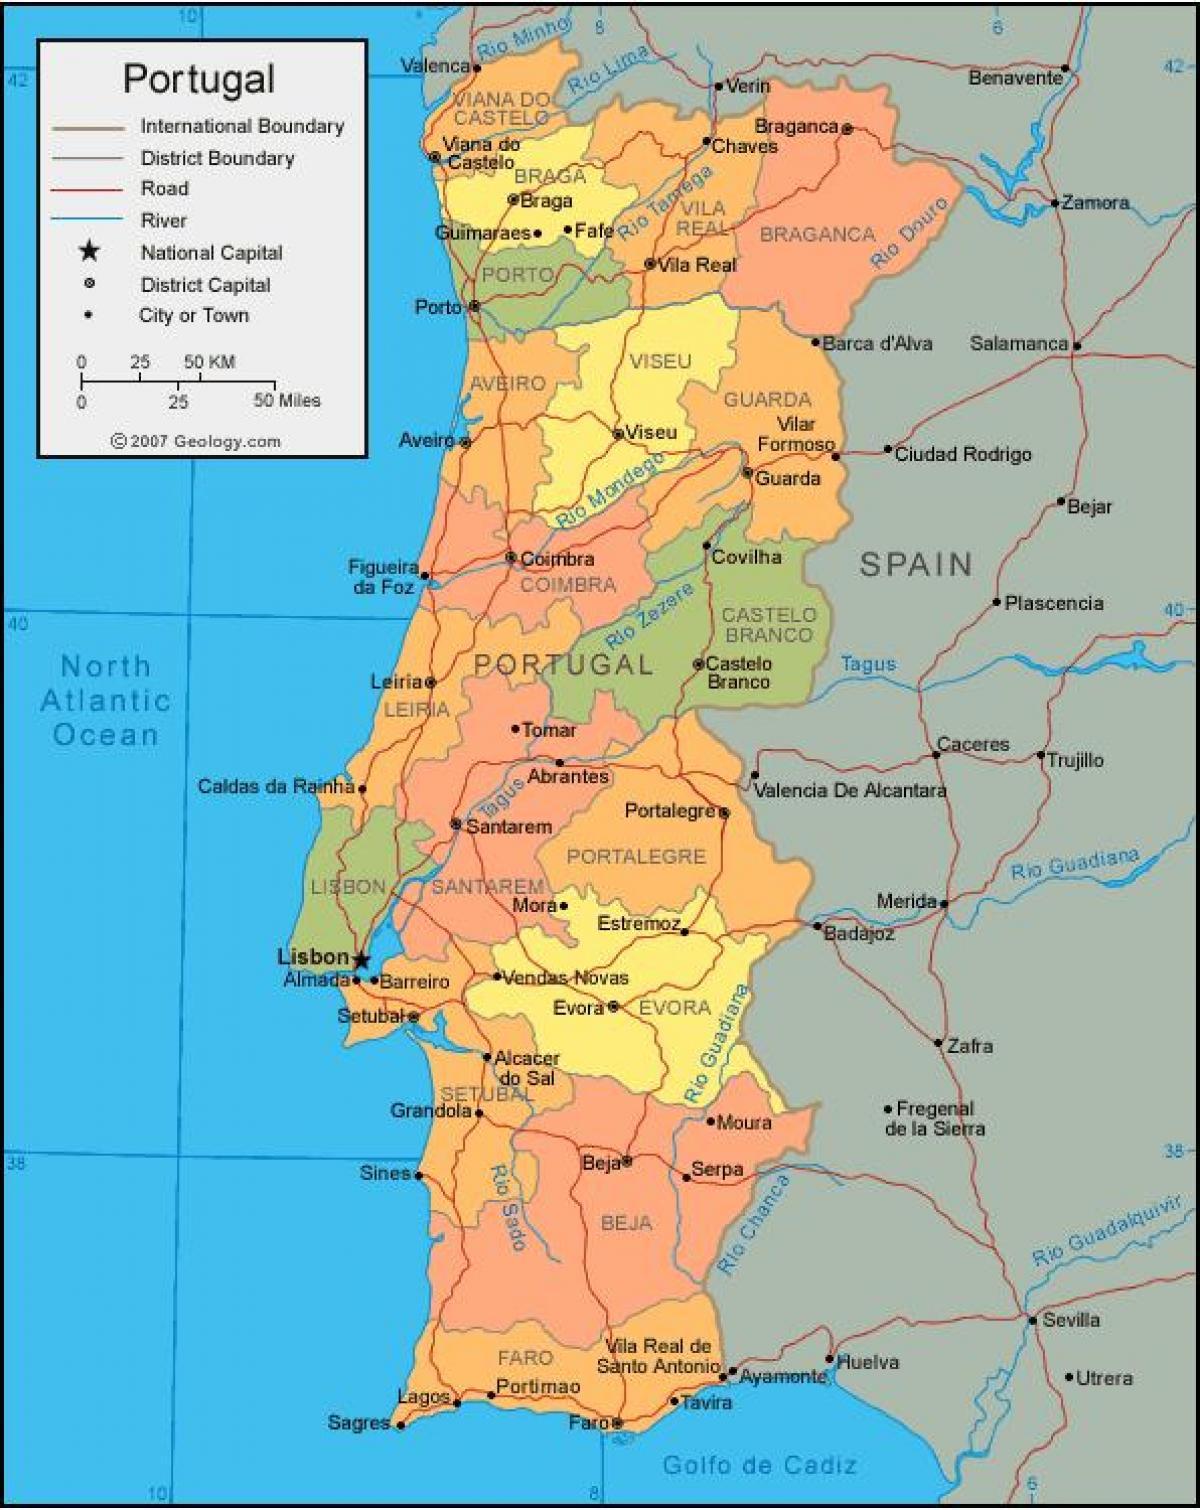 Karta Europa Portugal.Portugal Stater Karta Karta Over Portugal Staterna Sodra Europa